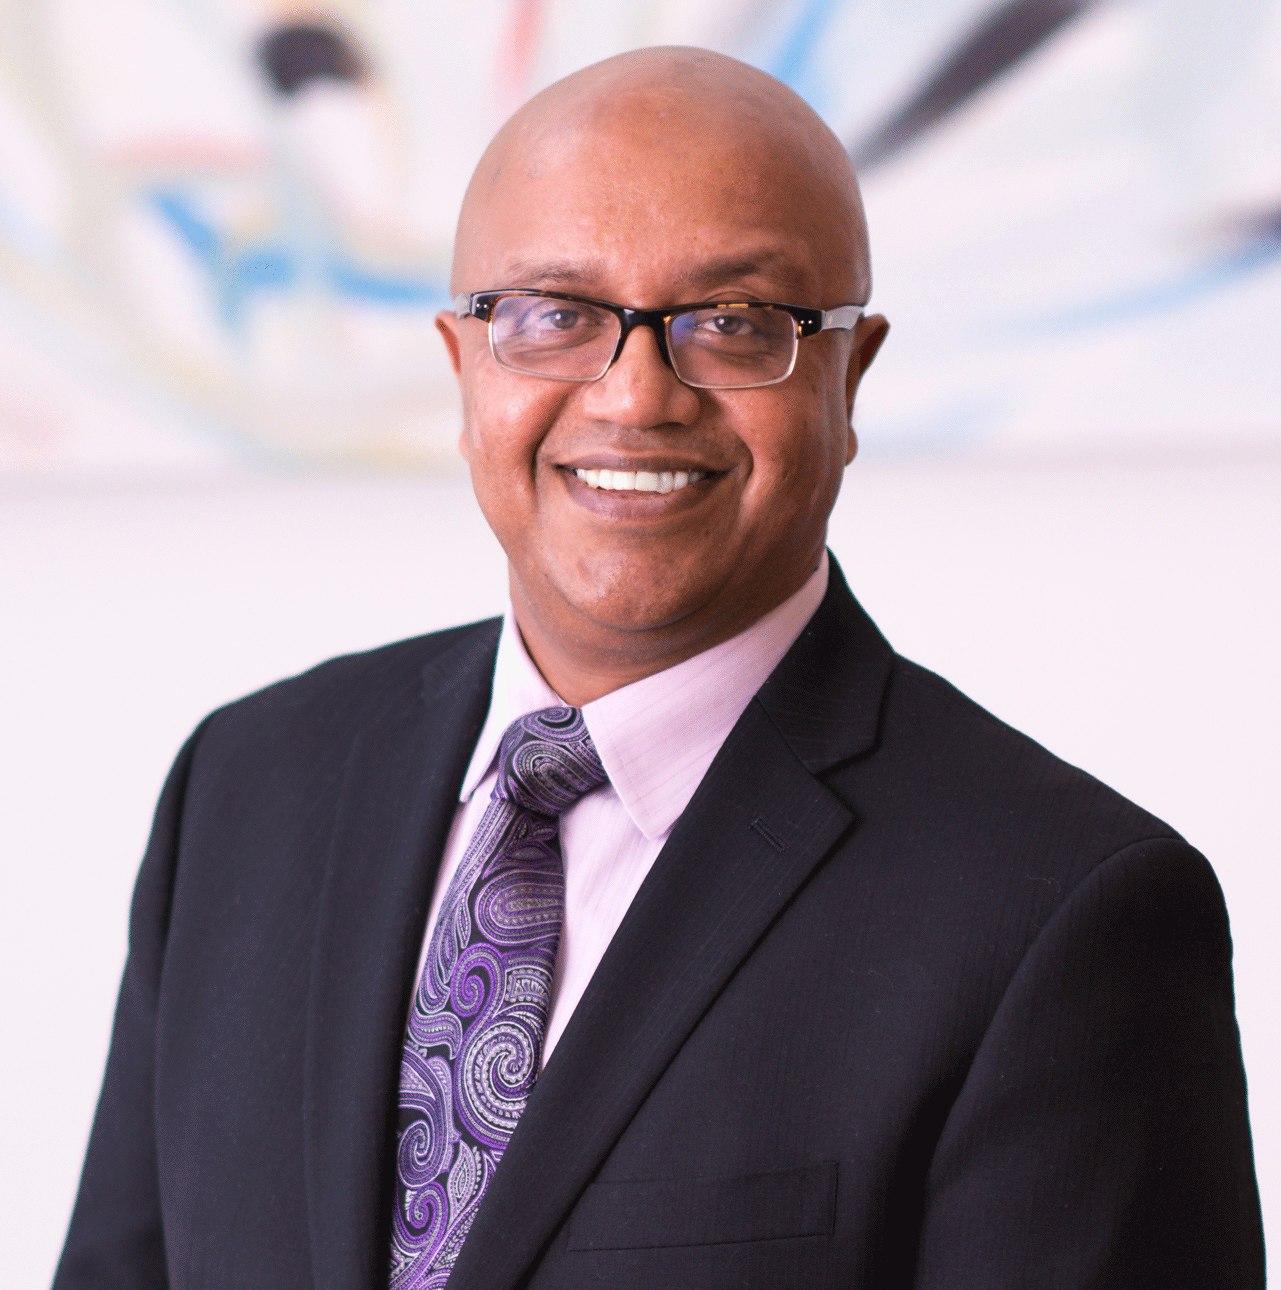 Dr. Sudeep J Ross MD